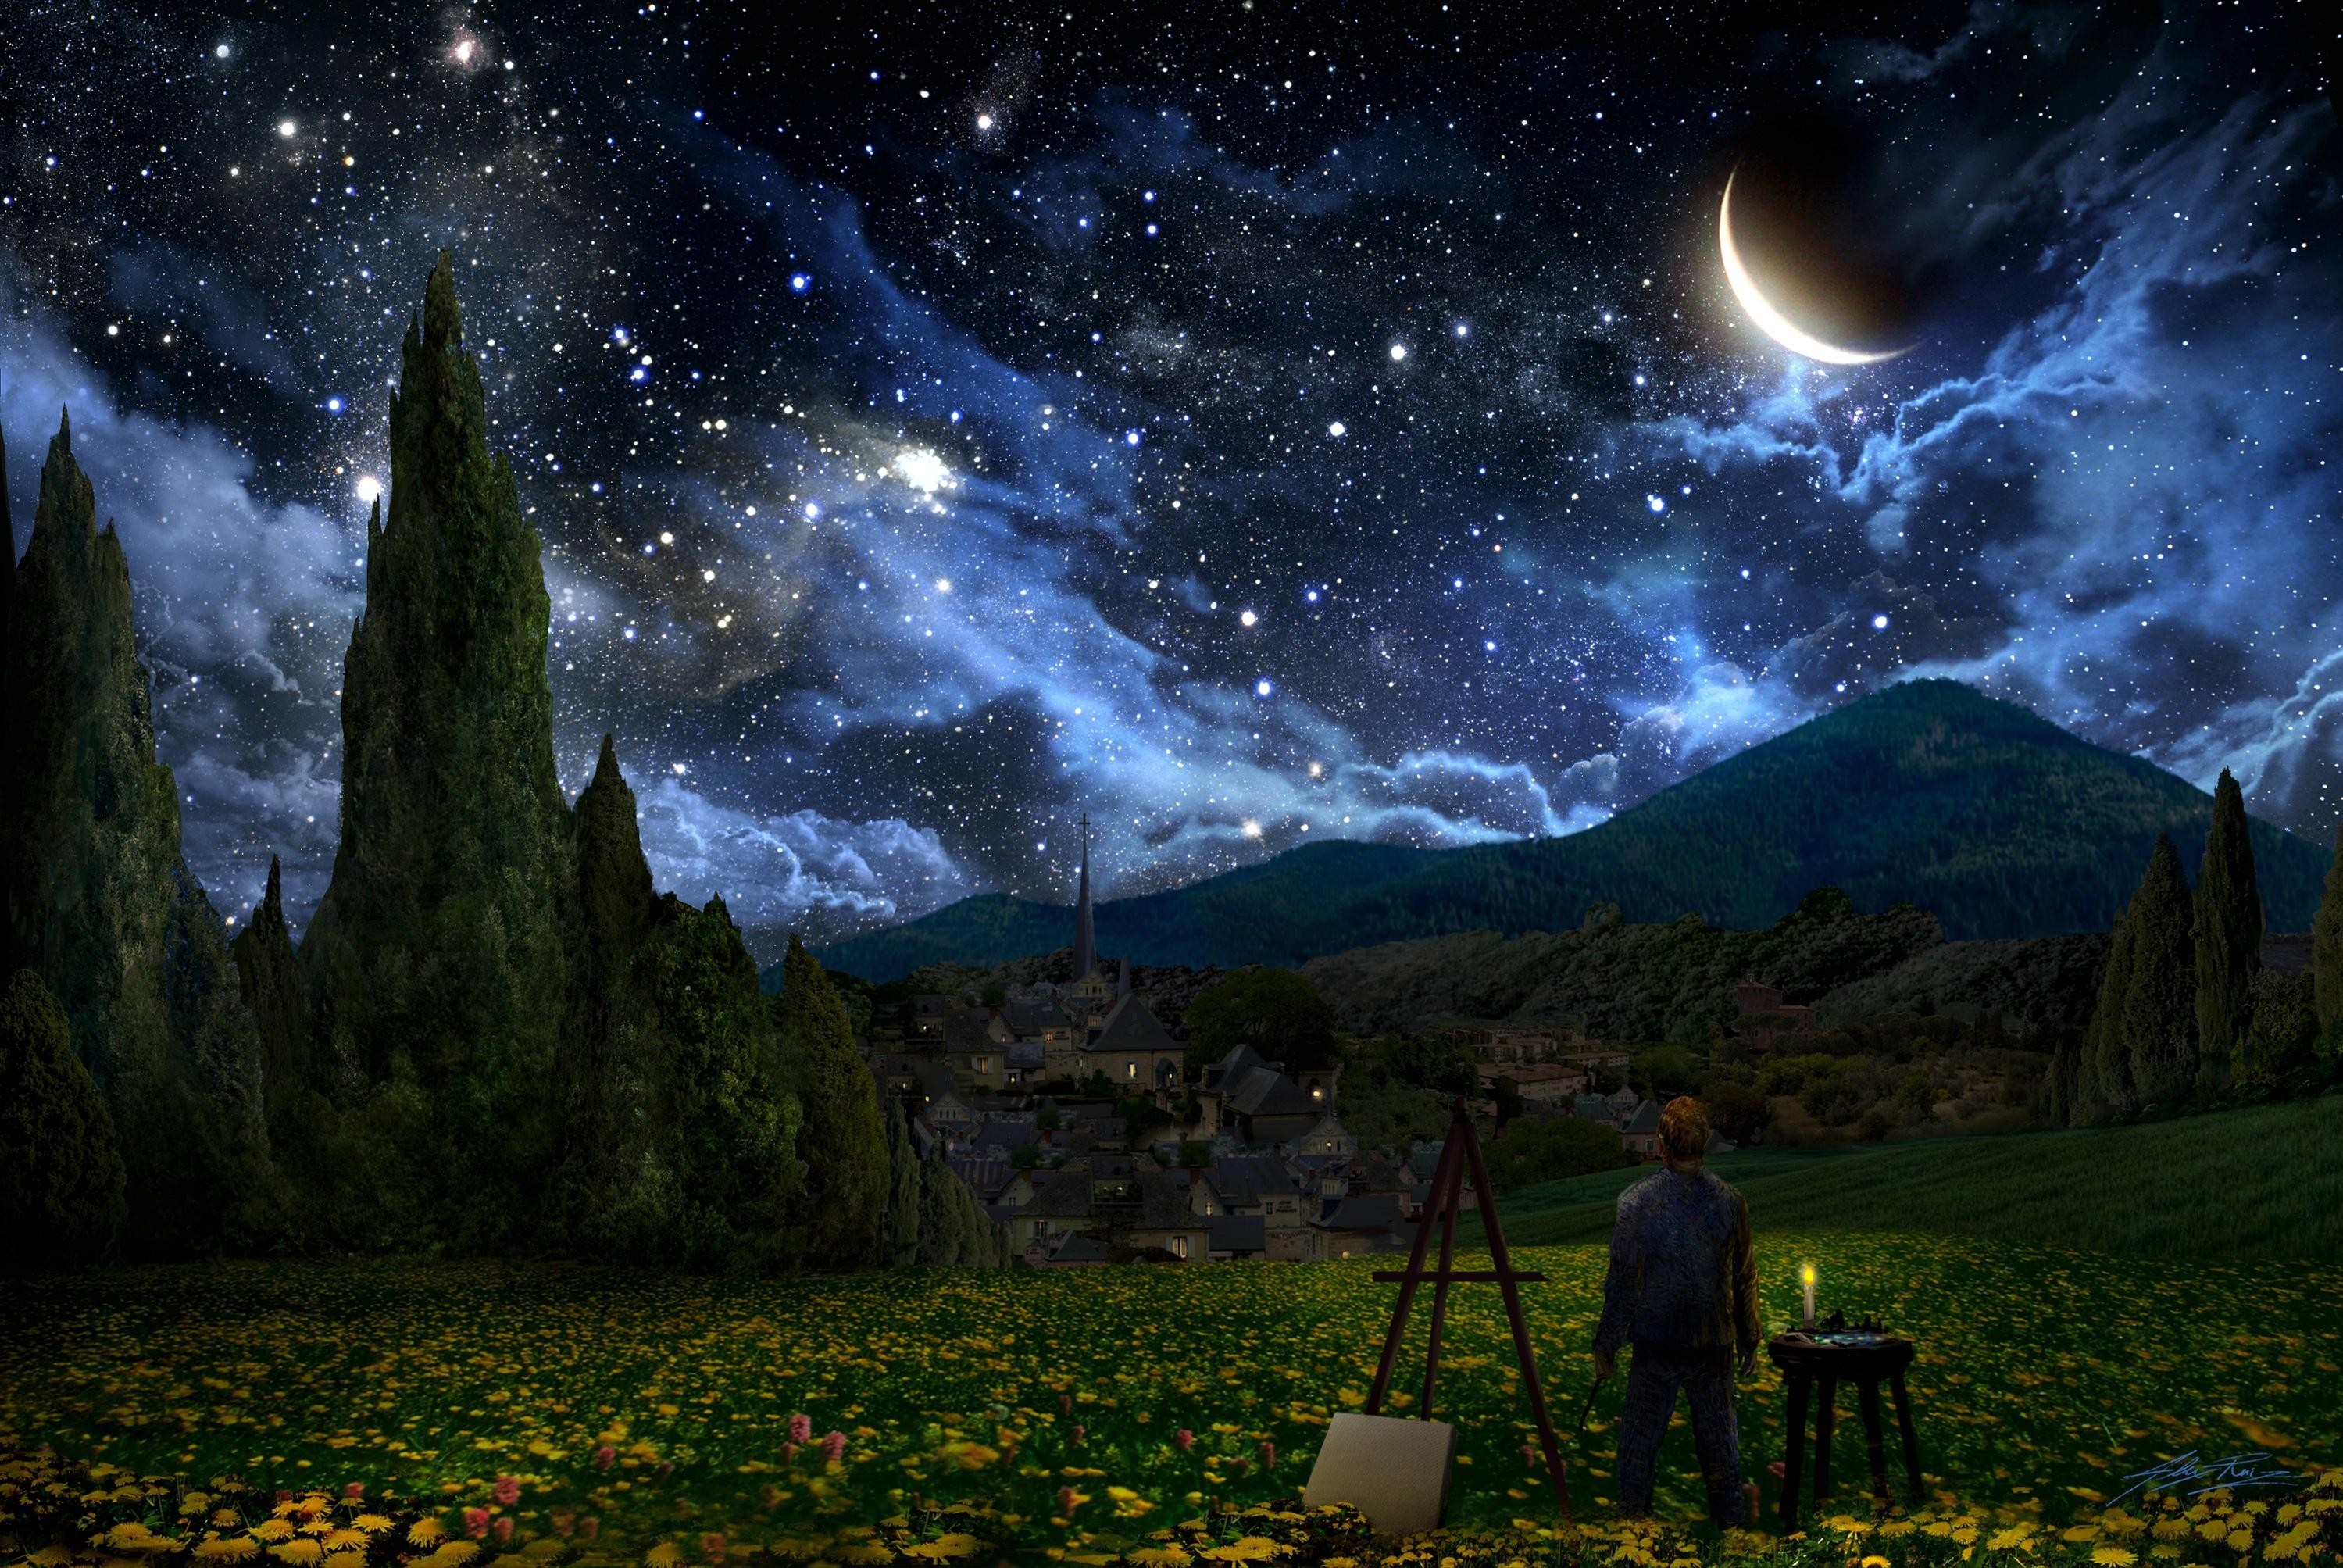 Best Wallpaper Night Ios - 368082-starry-night-wallpaper-2999x2007-ios  Photograph-386055.jpg